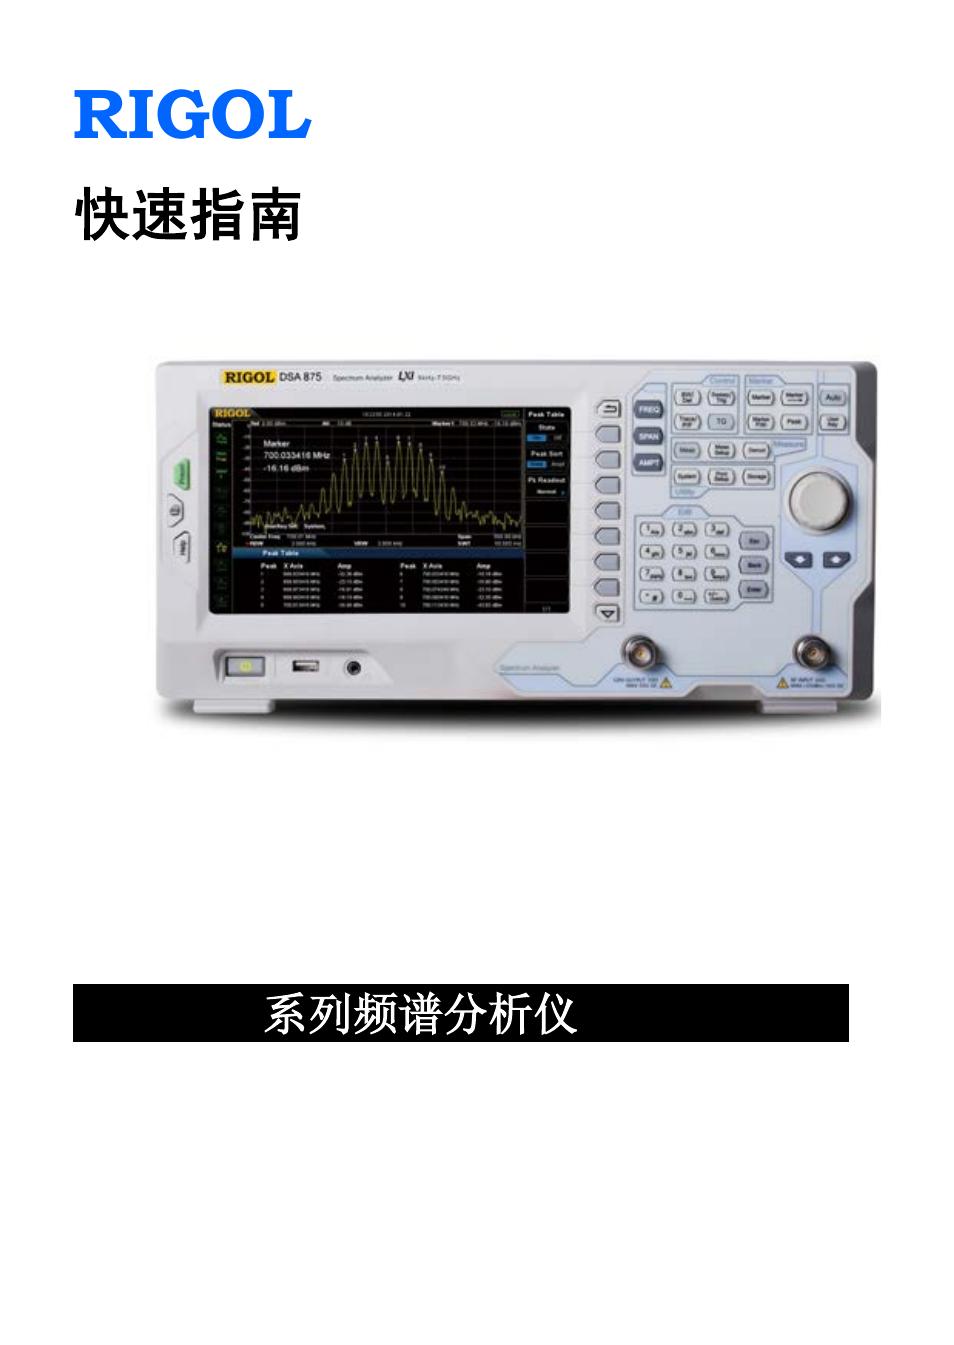 RIGOL DSA875 User Manual | 12 pages | Also for: DSA832